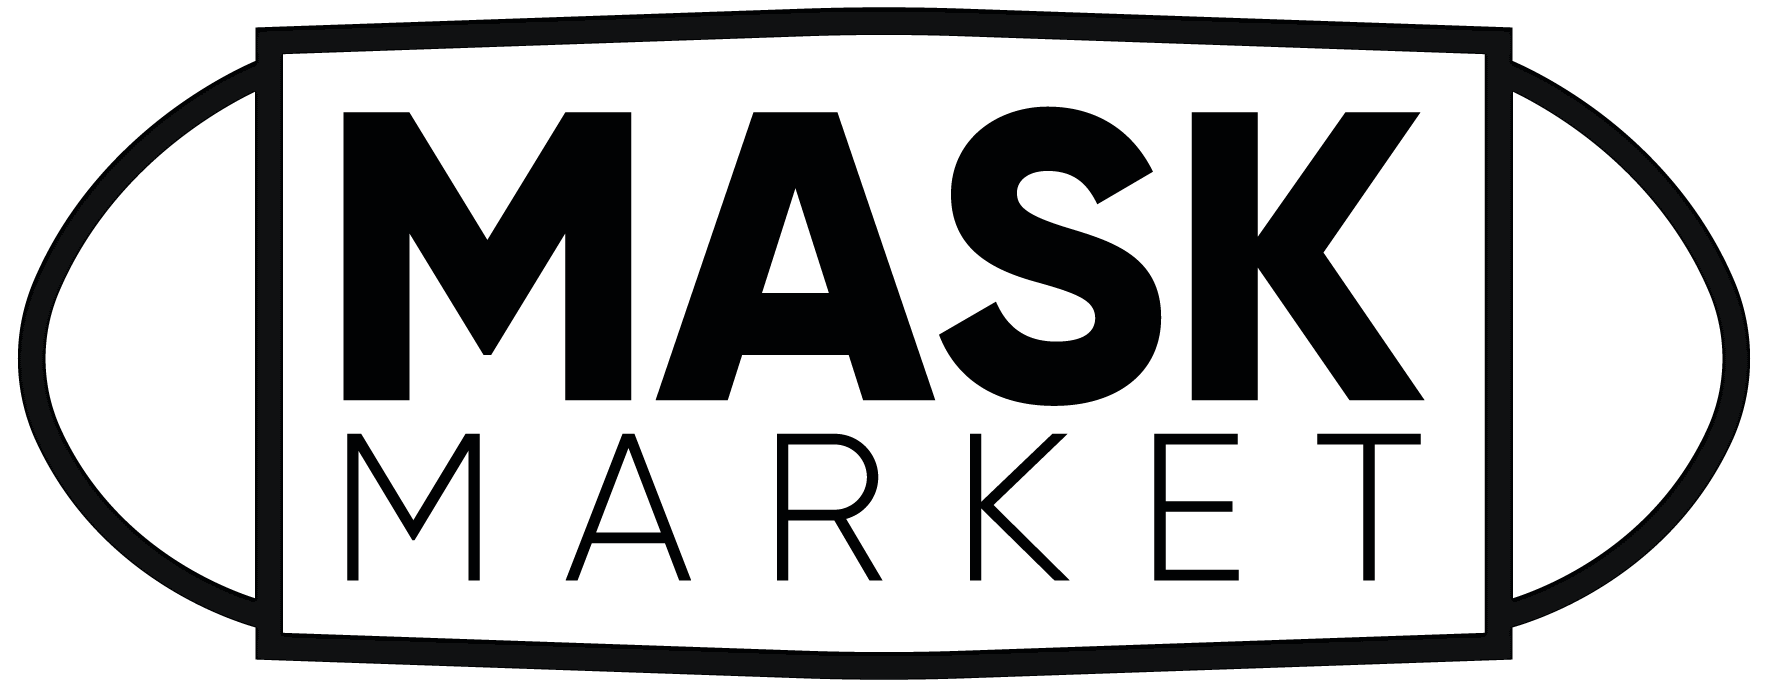 Custom Face Mask Company Announces Scholarship For Essay Winner